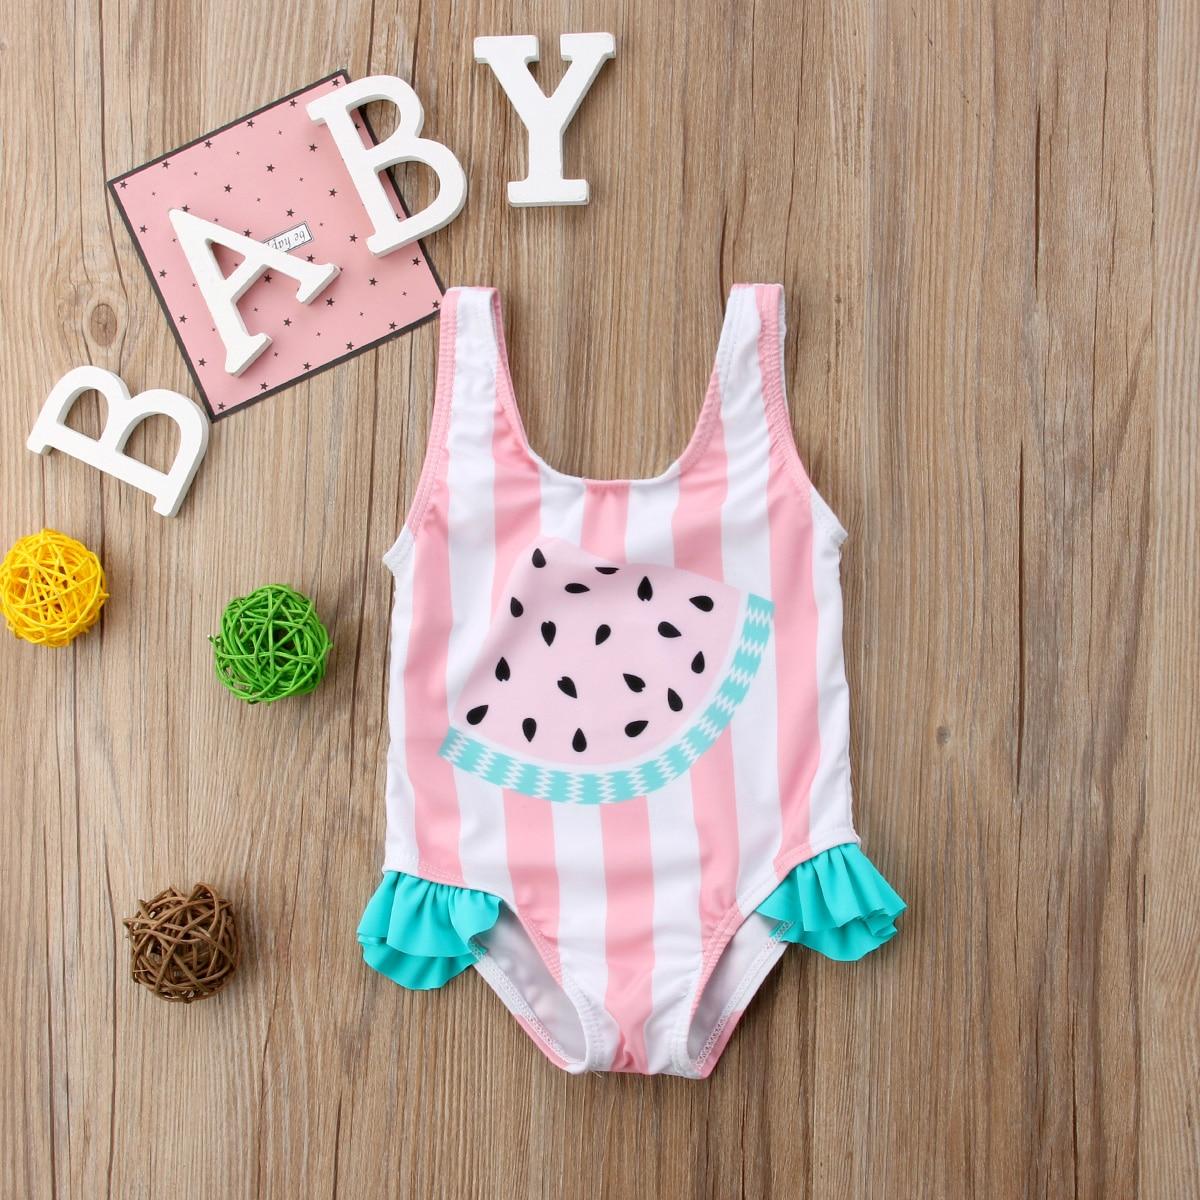 Pudcoco Newest Fashion Newborn Baby Girl Swimwear Watermelon Striped Swimsuit Swimming One-Piece Bikini